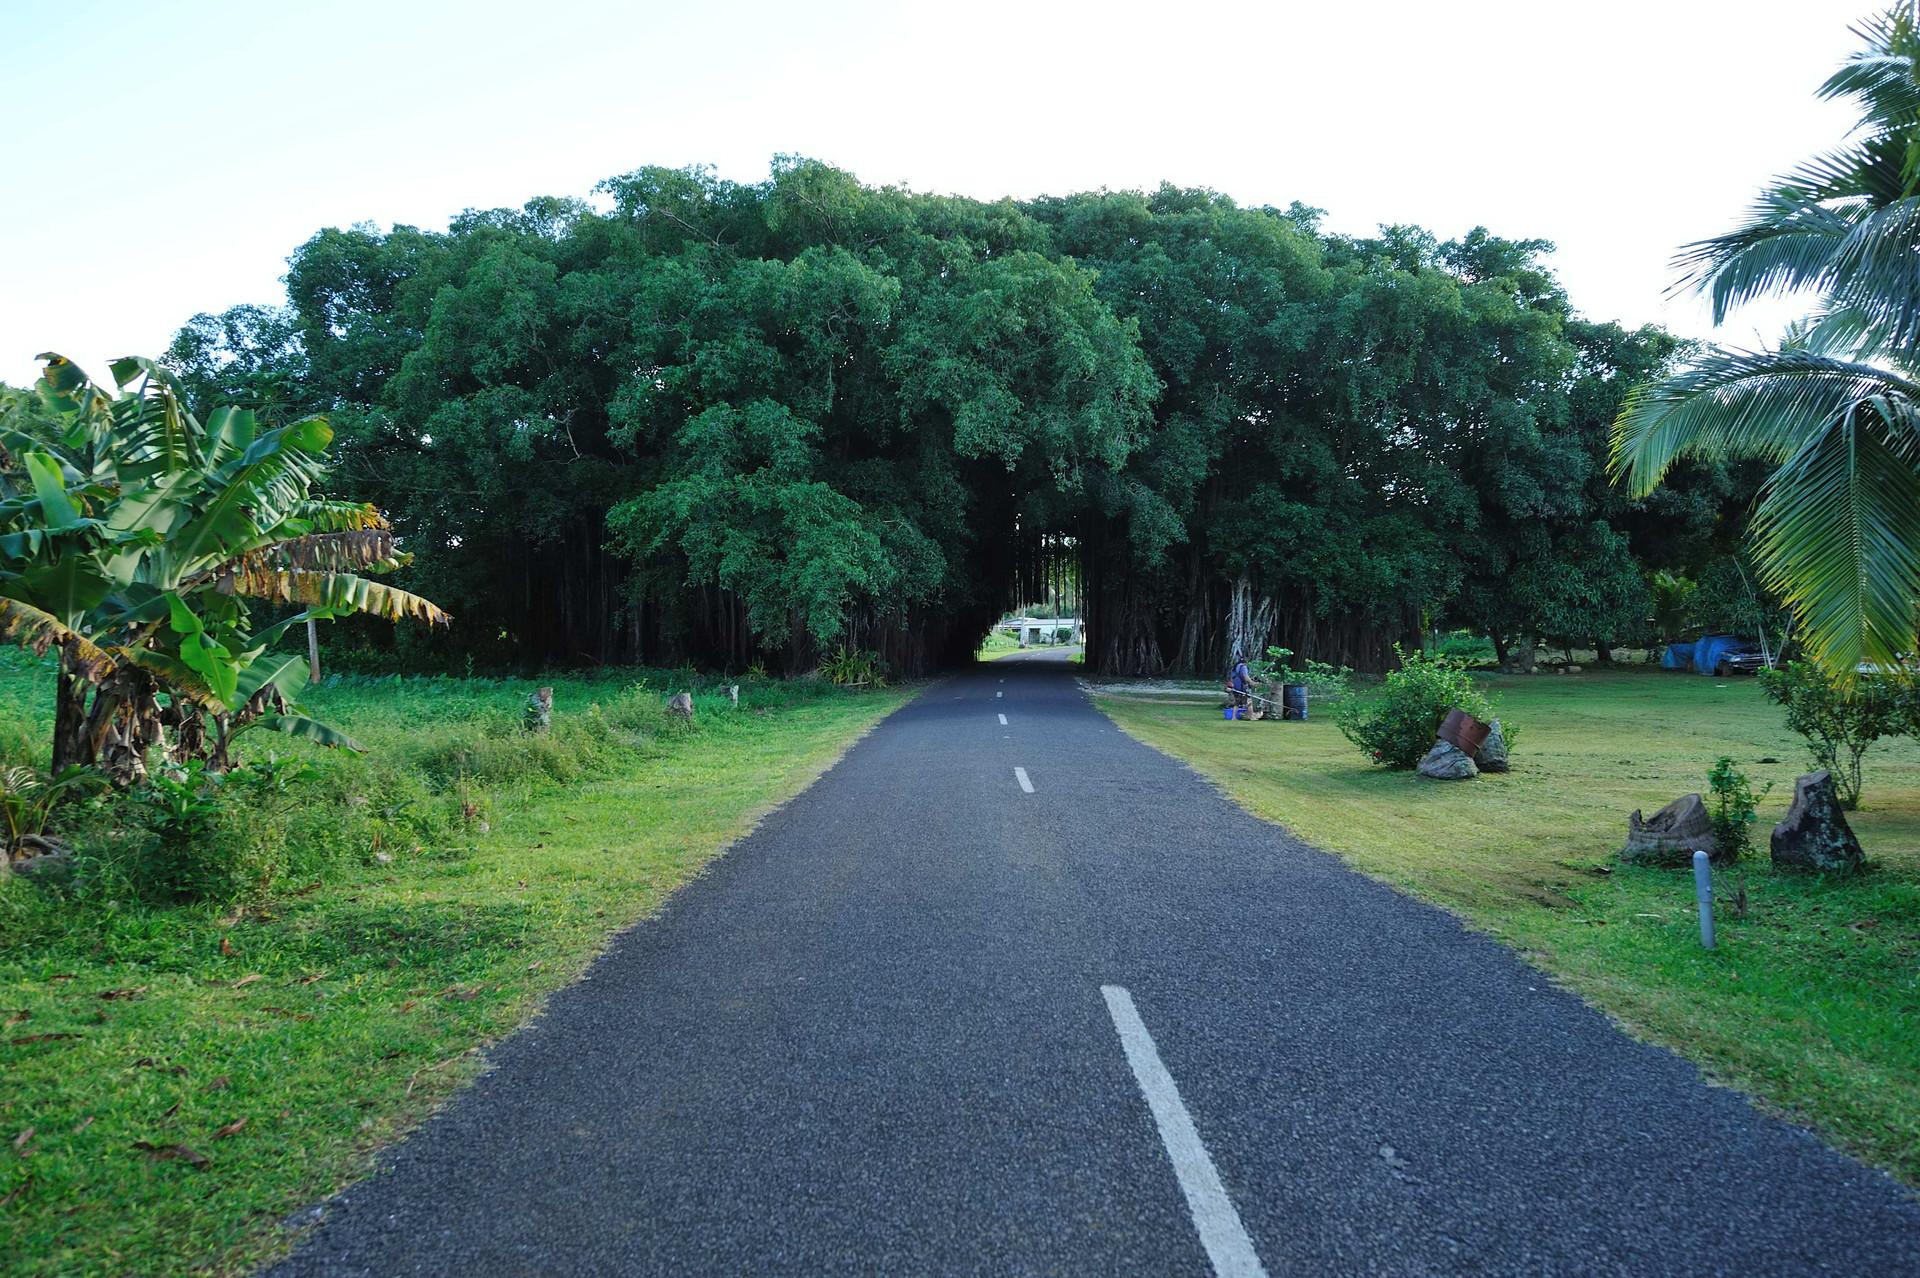 Driving through the giant Banyan tree